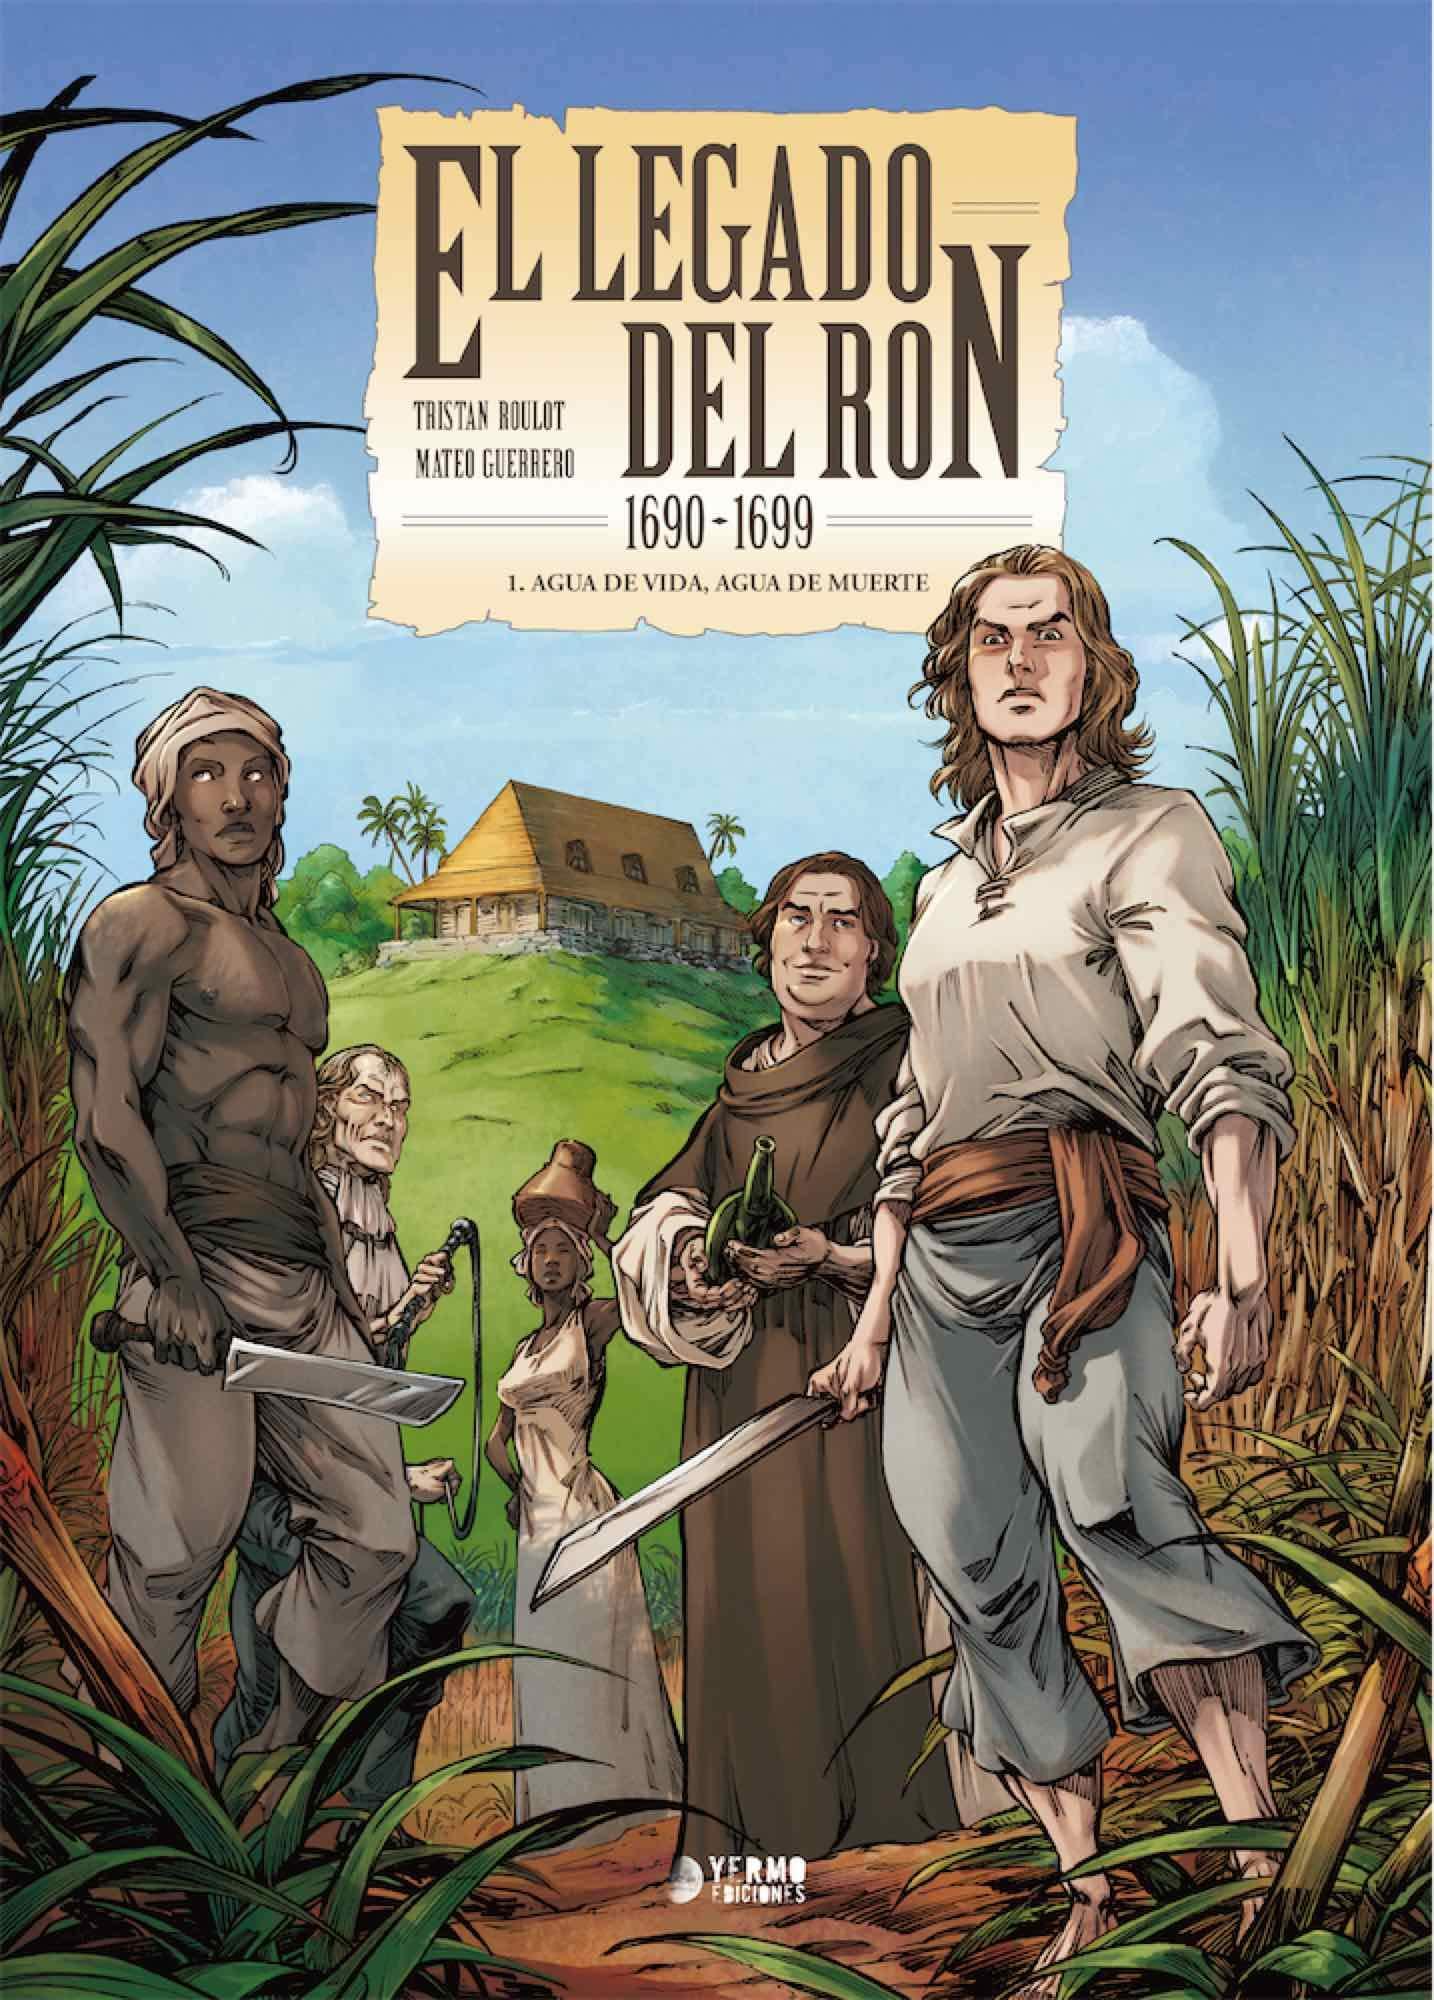 Legado del ron: Amazon.es: Roulot Tristan, Roulot Tristan: Libros